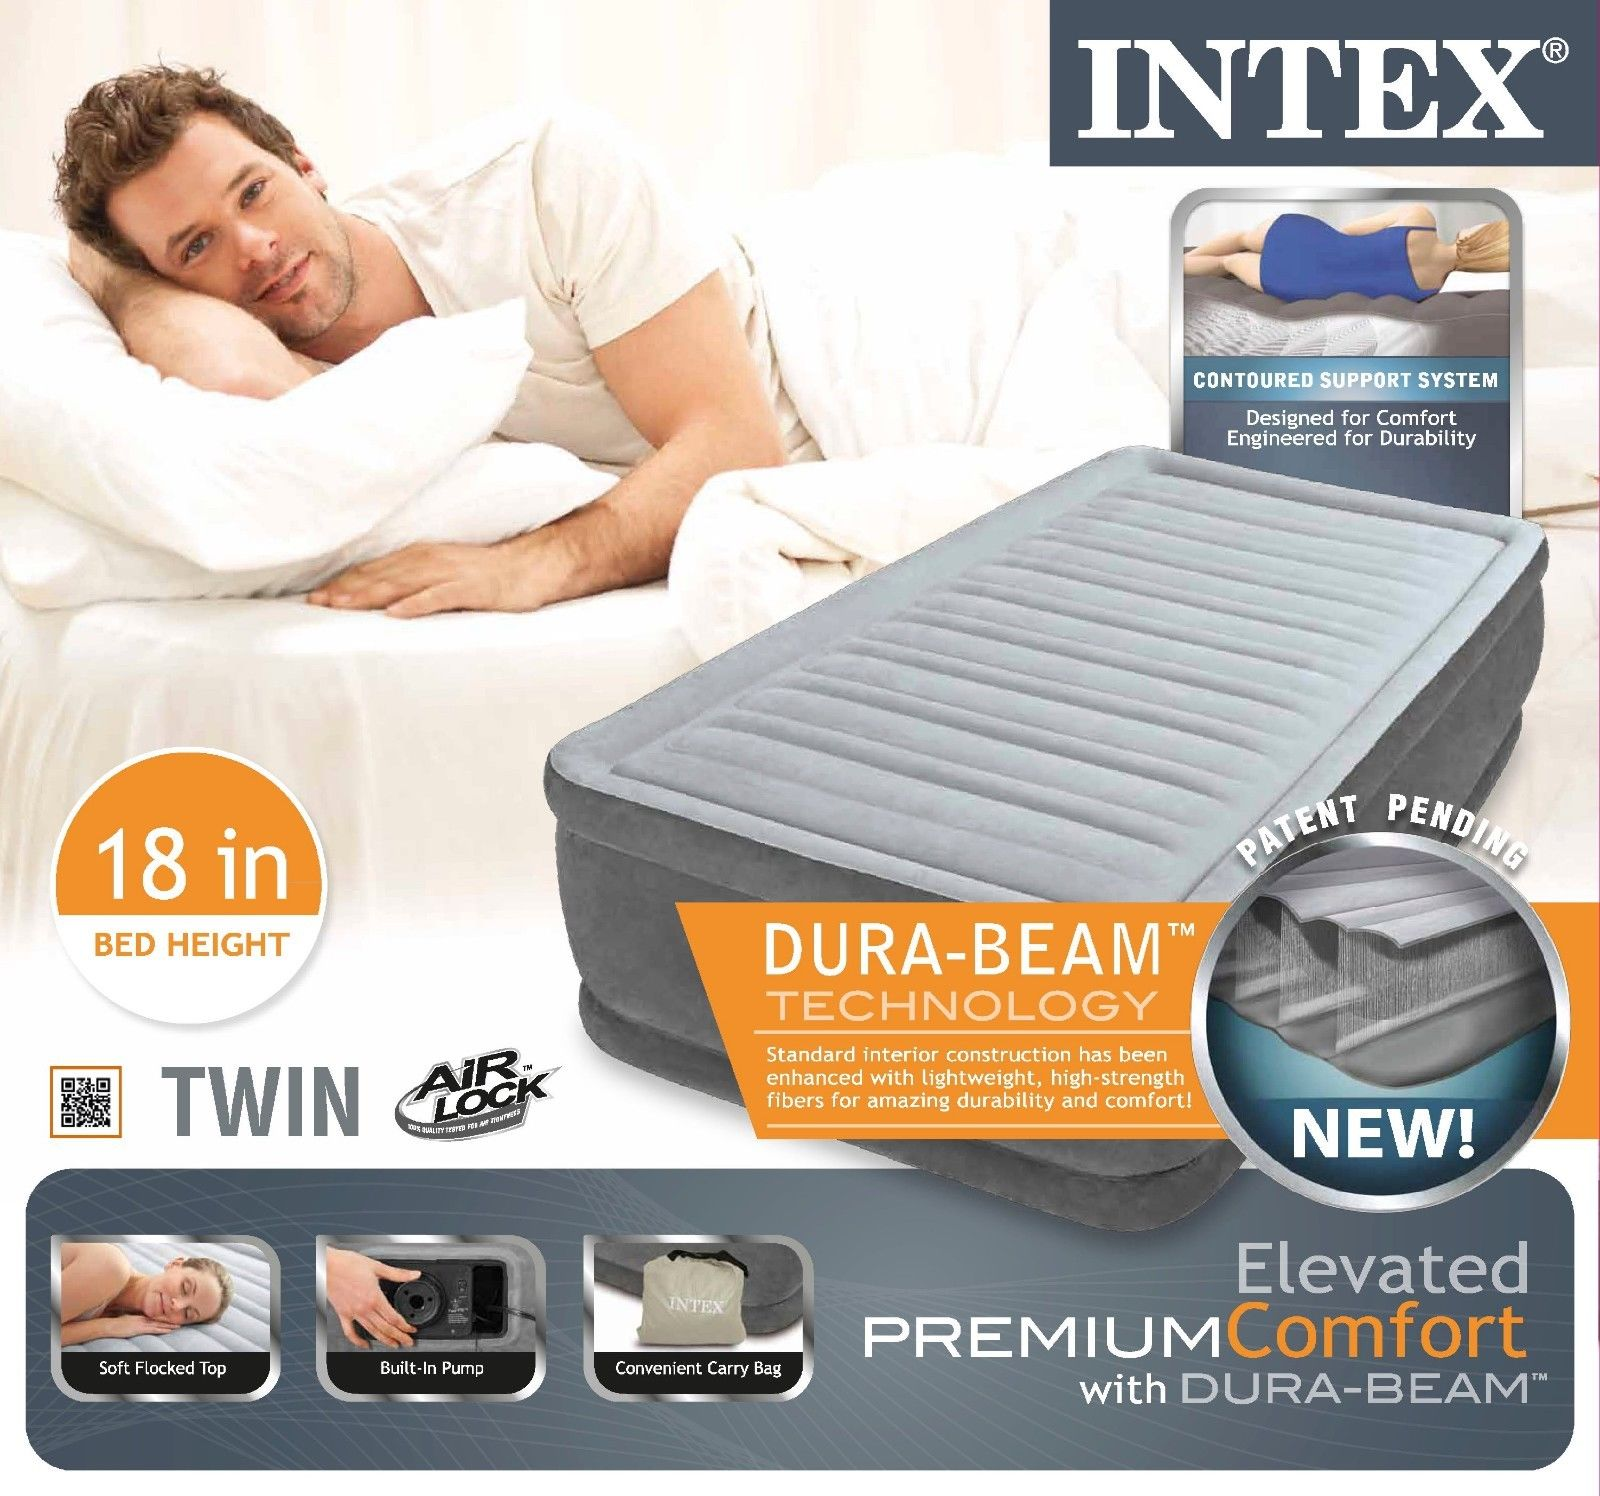 Intex Twin Raised Airbed Comfort Plush Dura Beam Air Bed ...